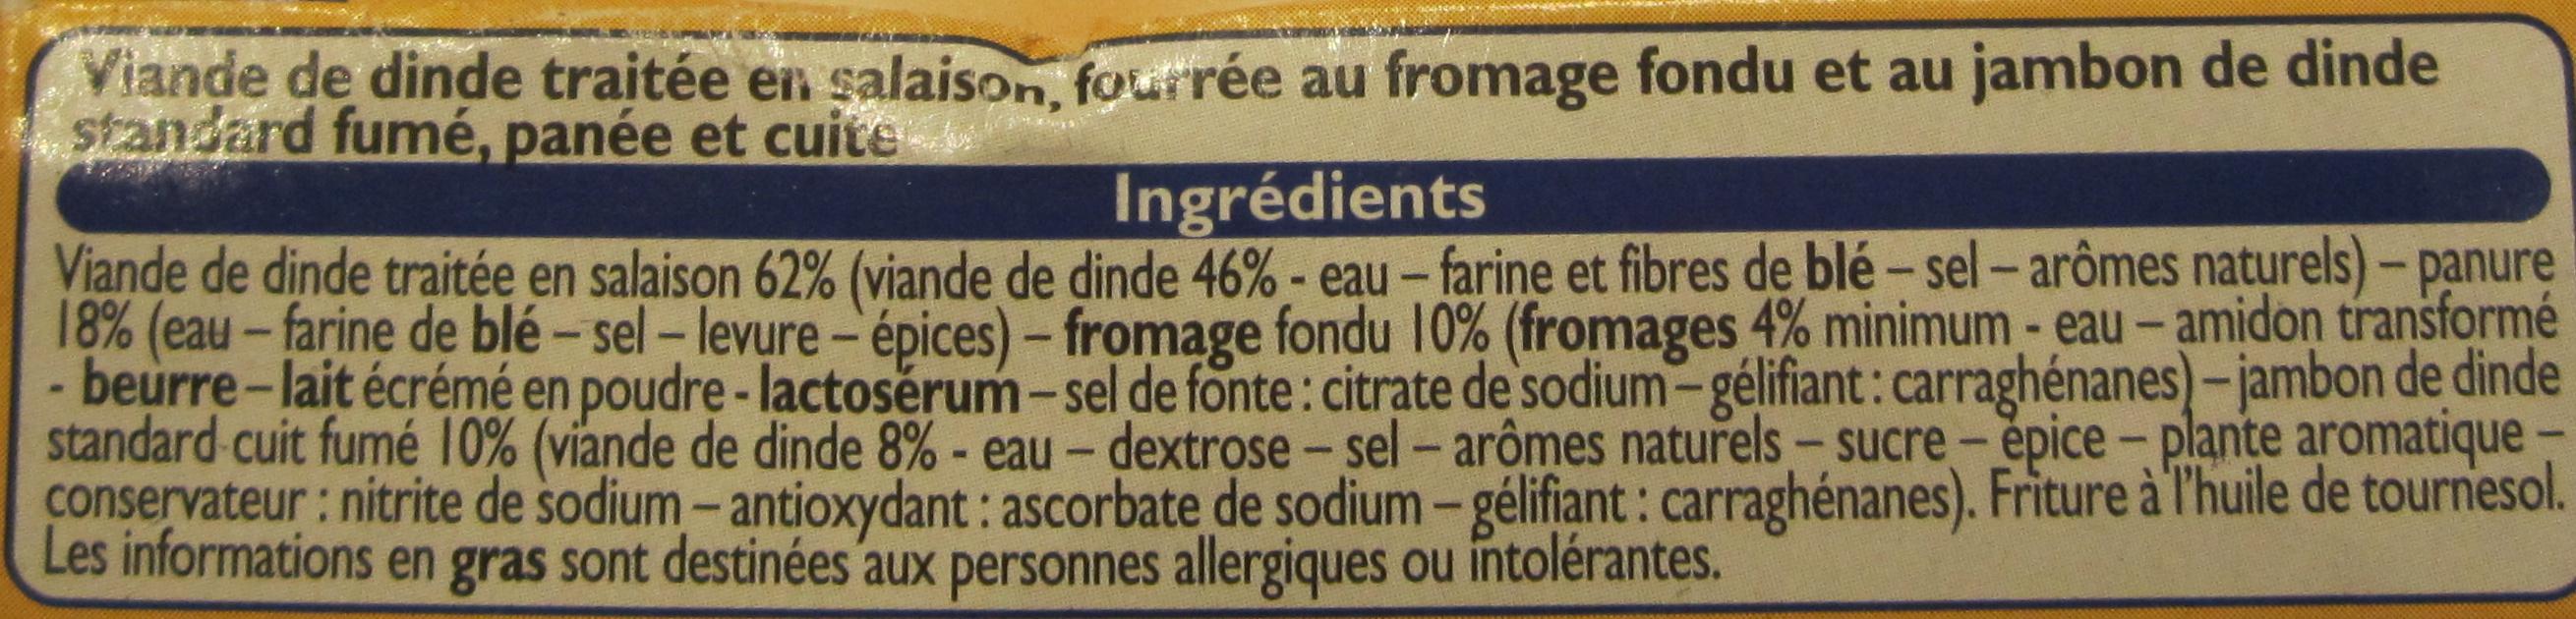 Cordon Bleu de Dinde - Ingredients - fr